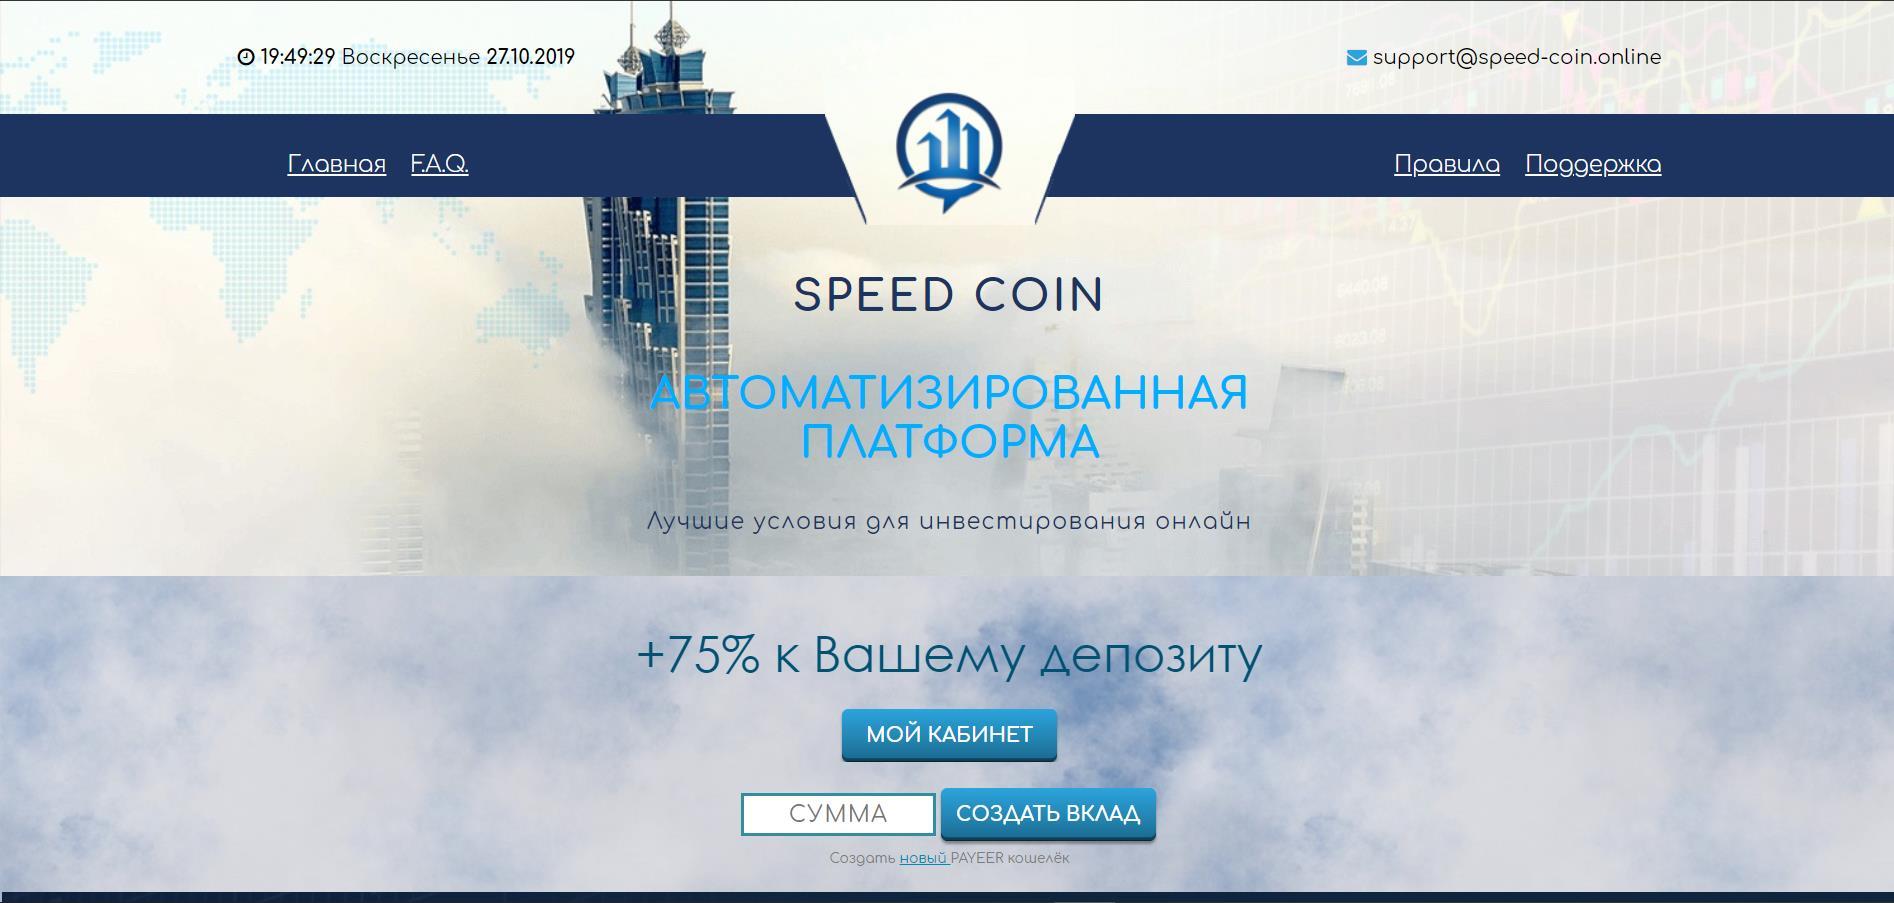 SPEED COIN